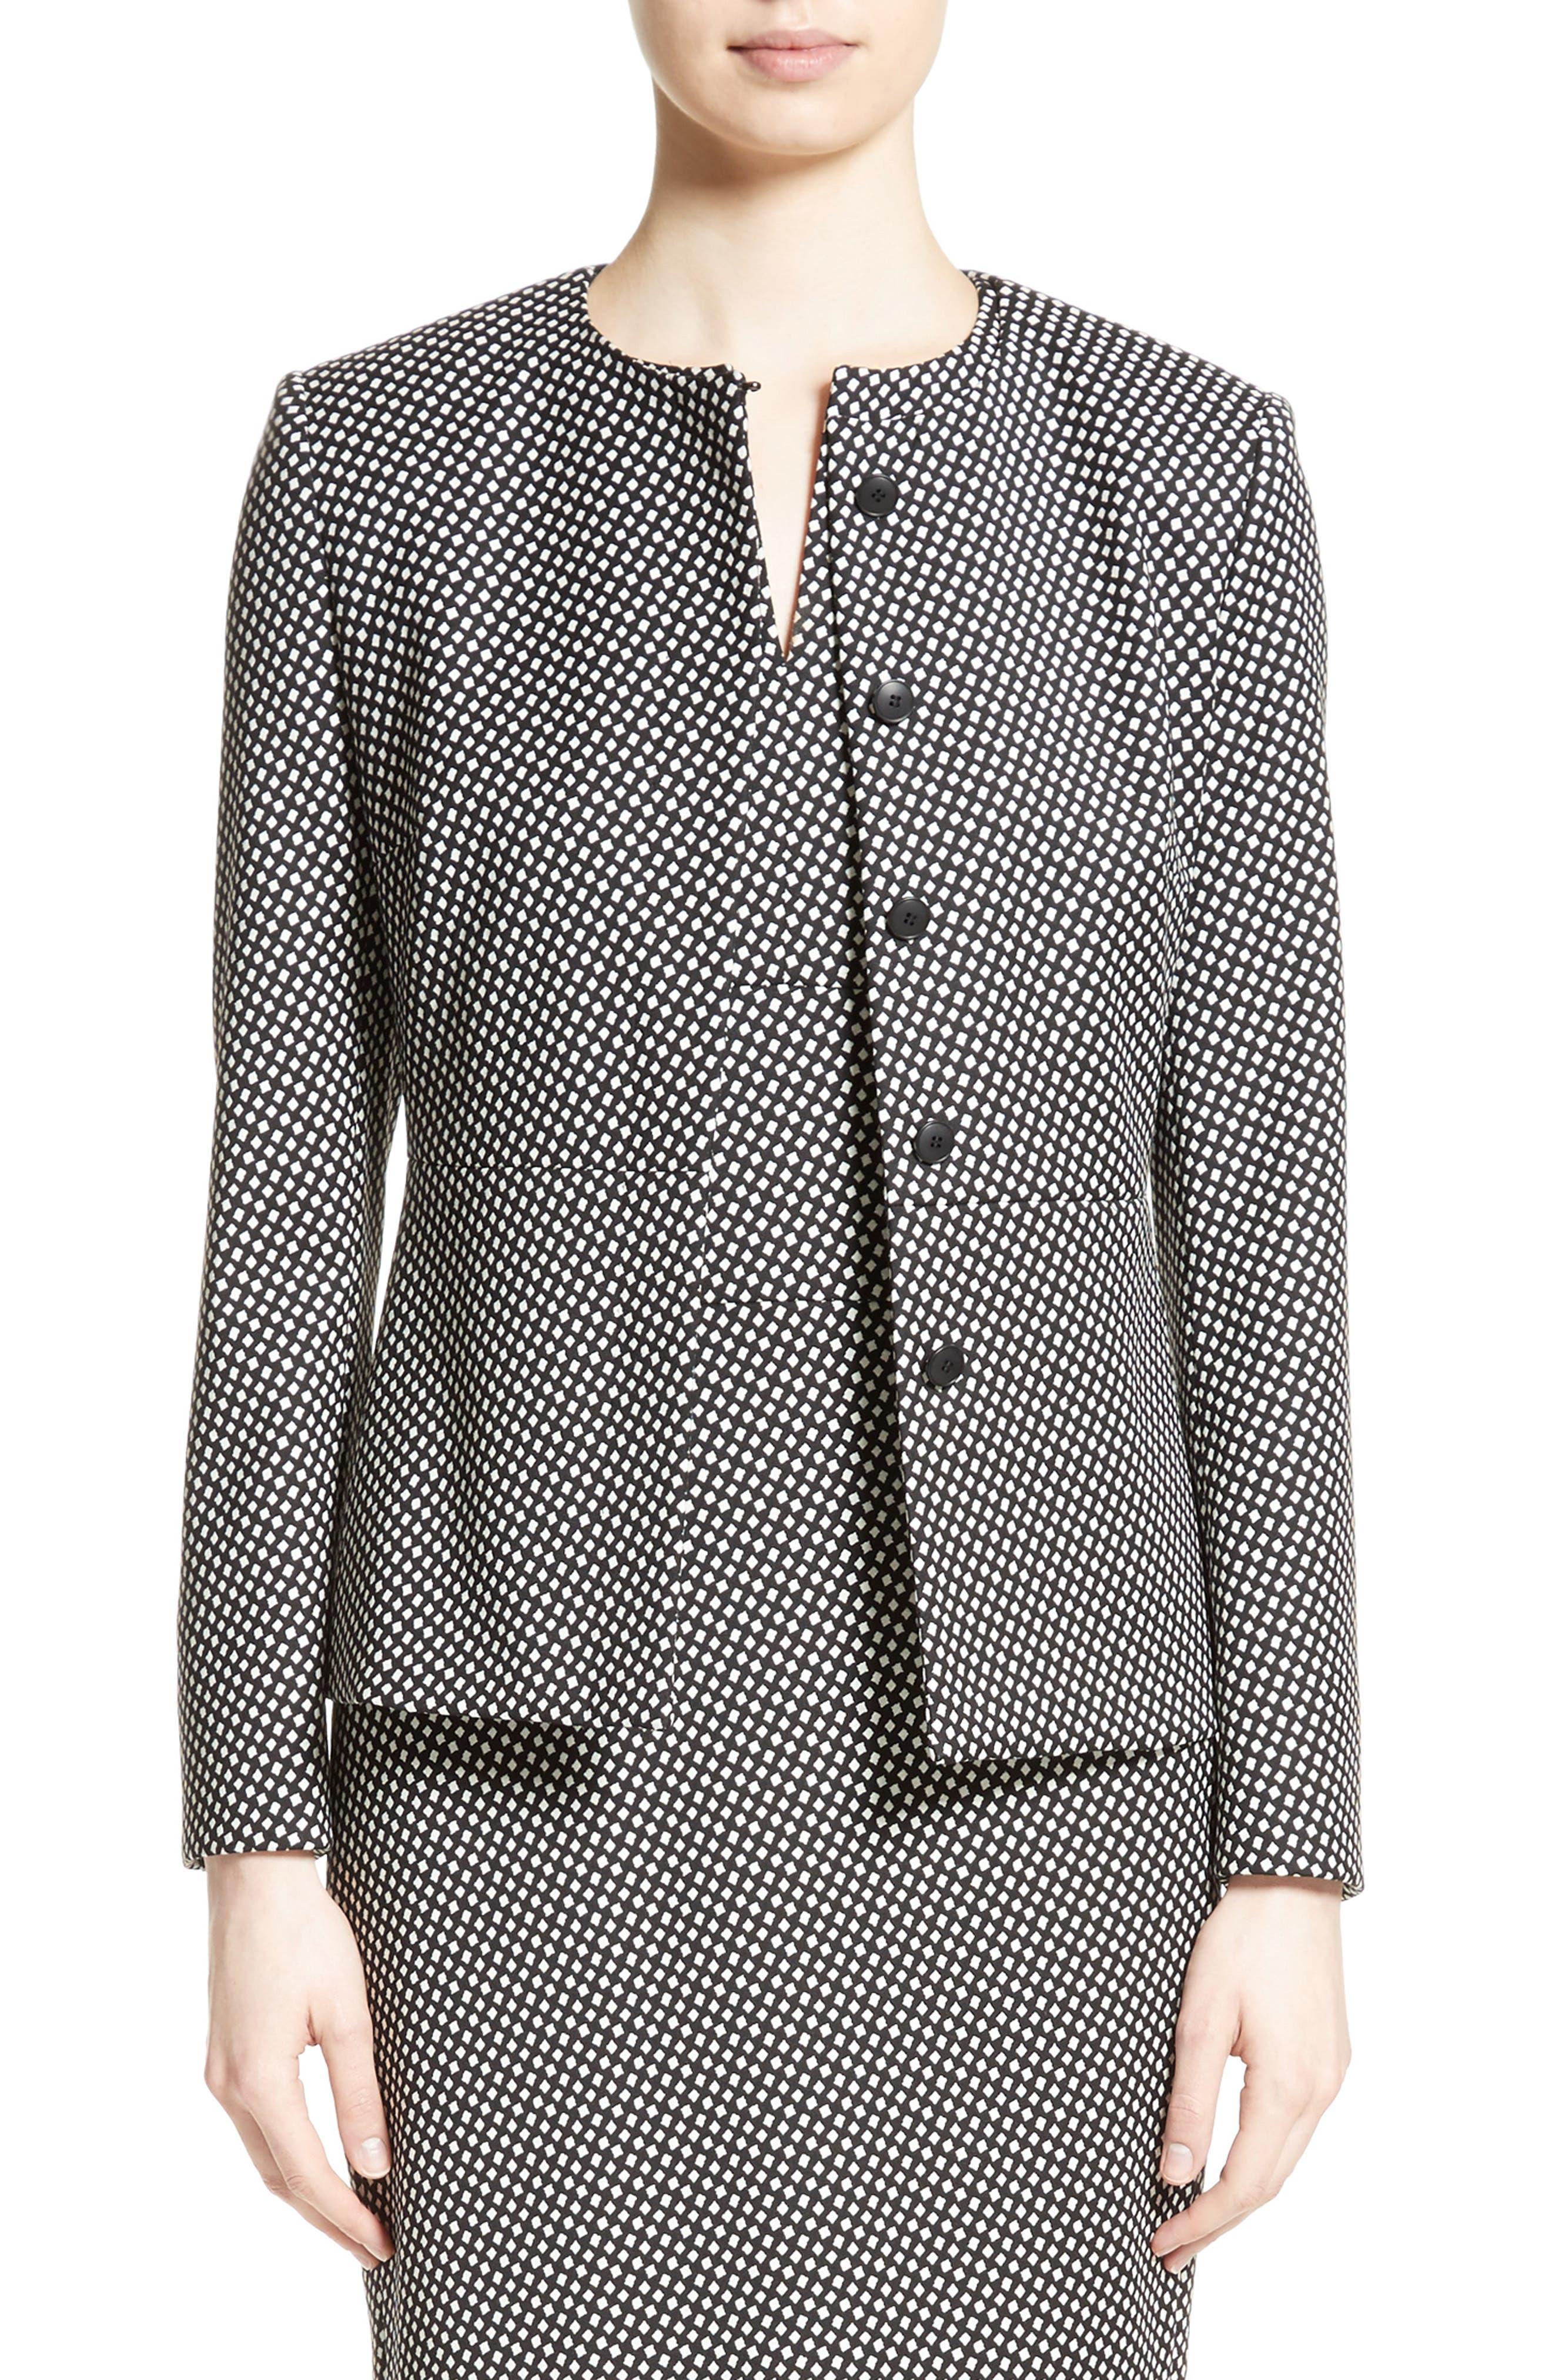 Ajaccio Wool Blend Jacquard Jacket,                             Main thumbnail 1, color,                             001